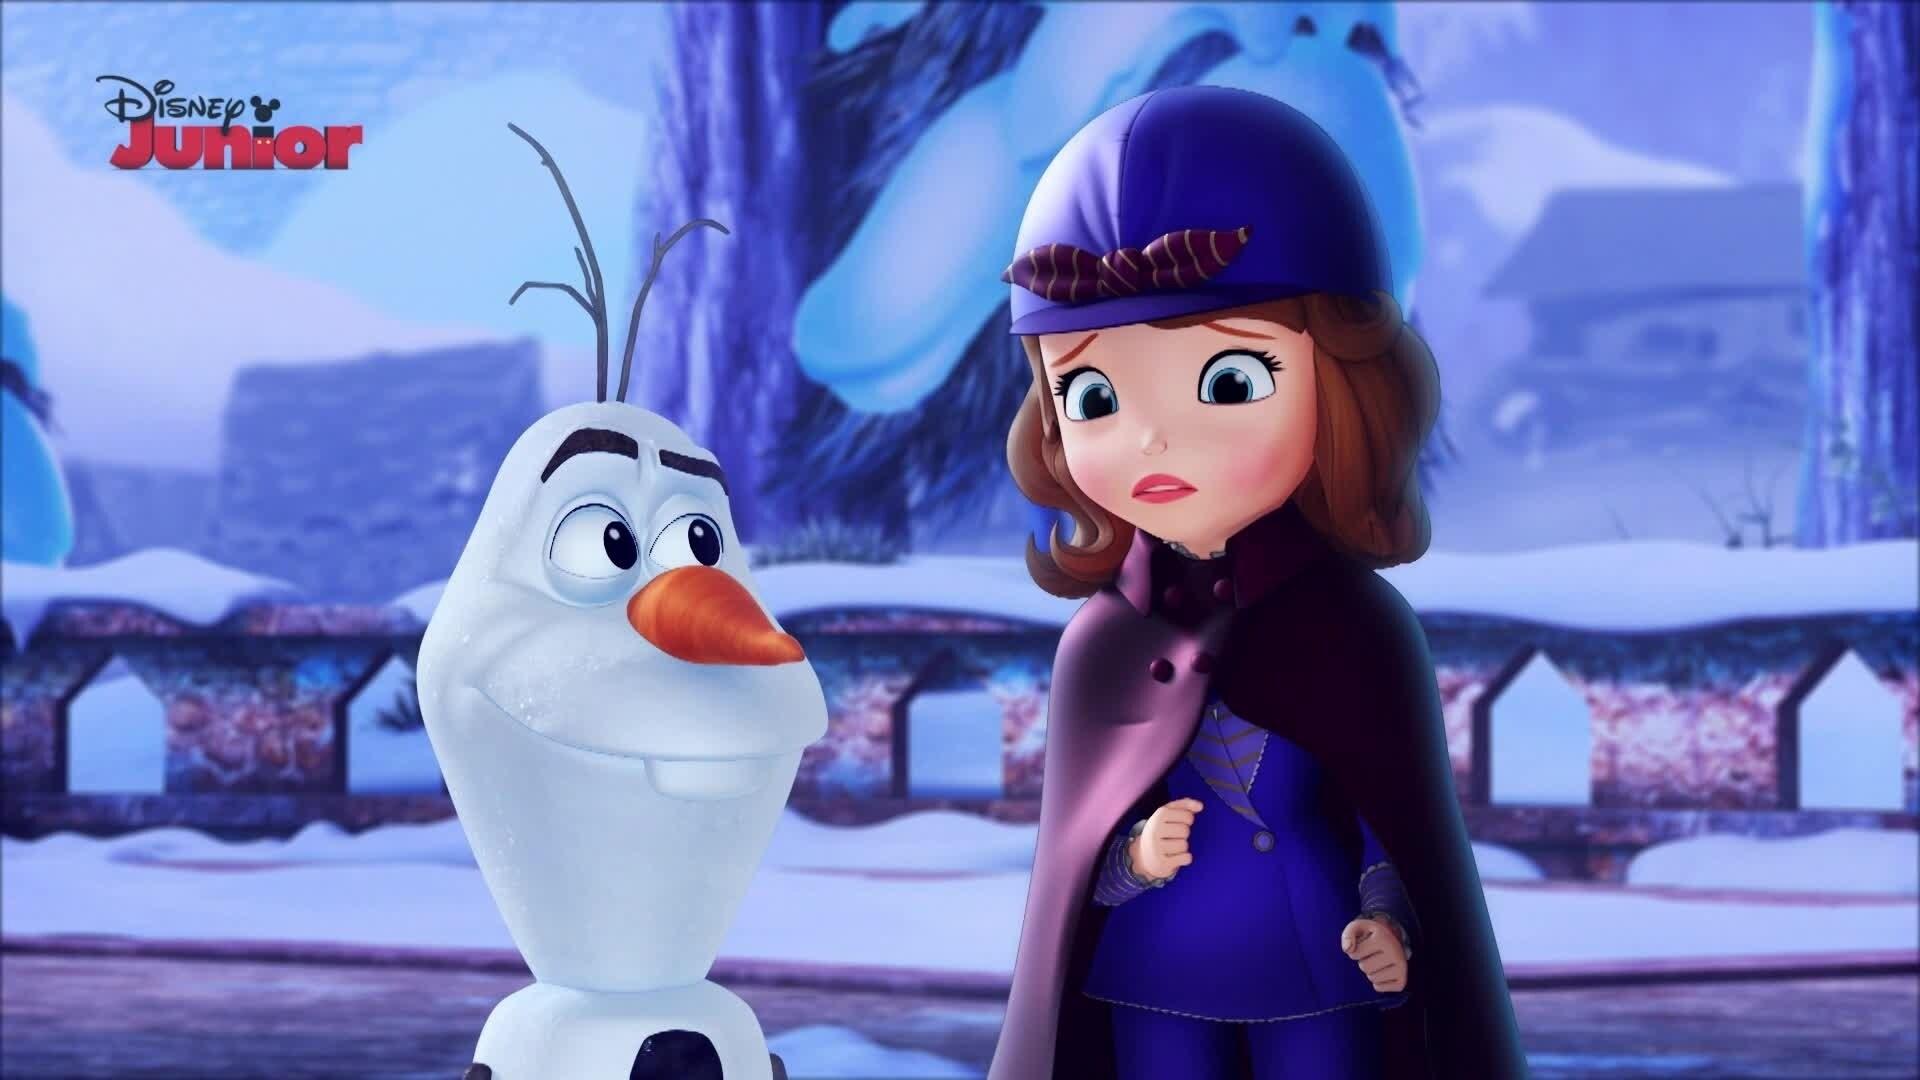 It's Olaf